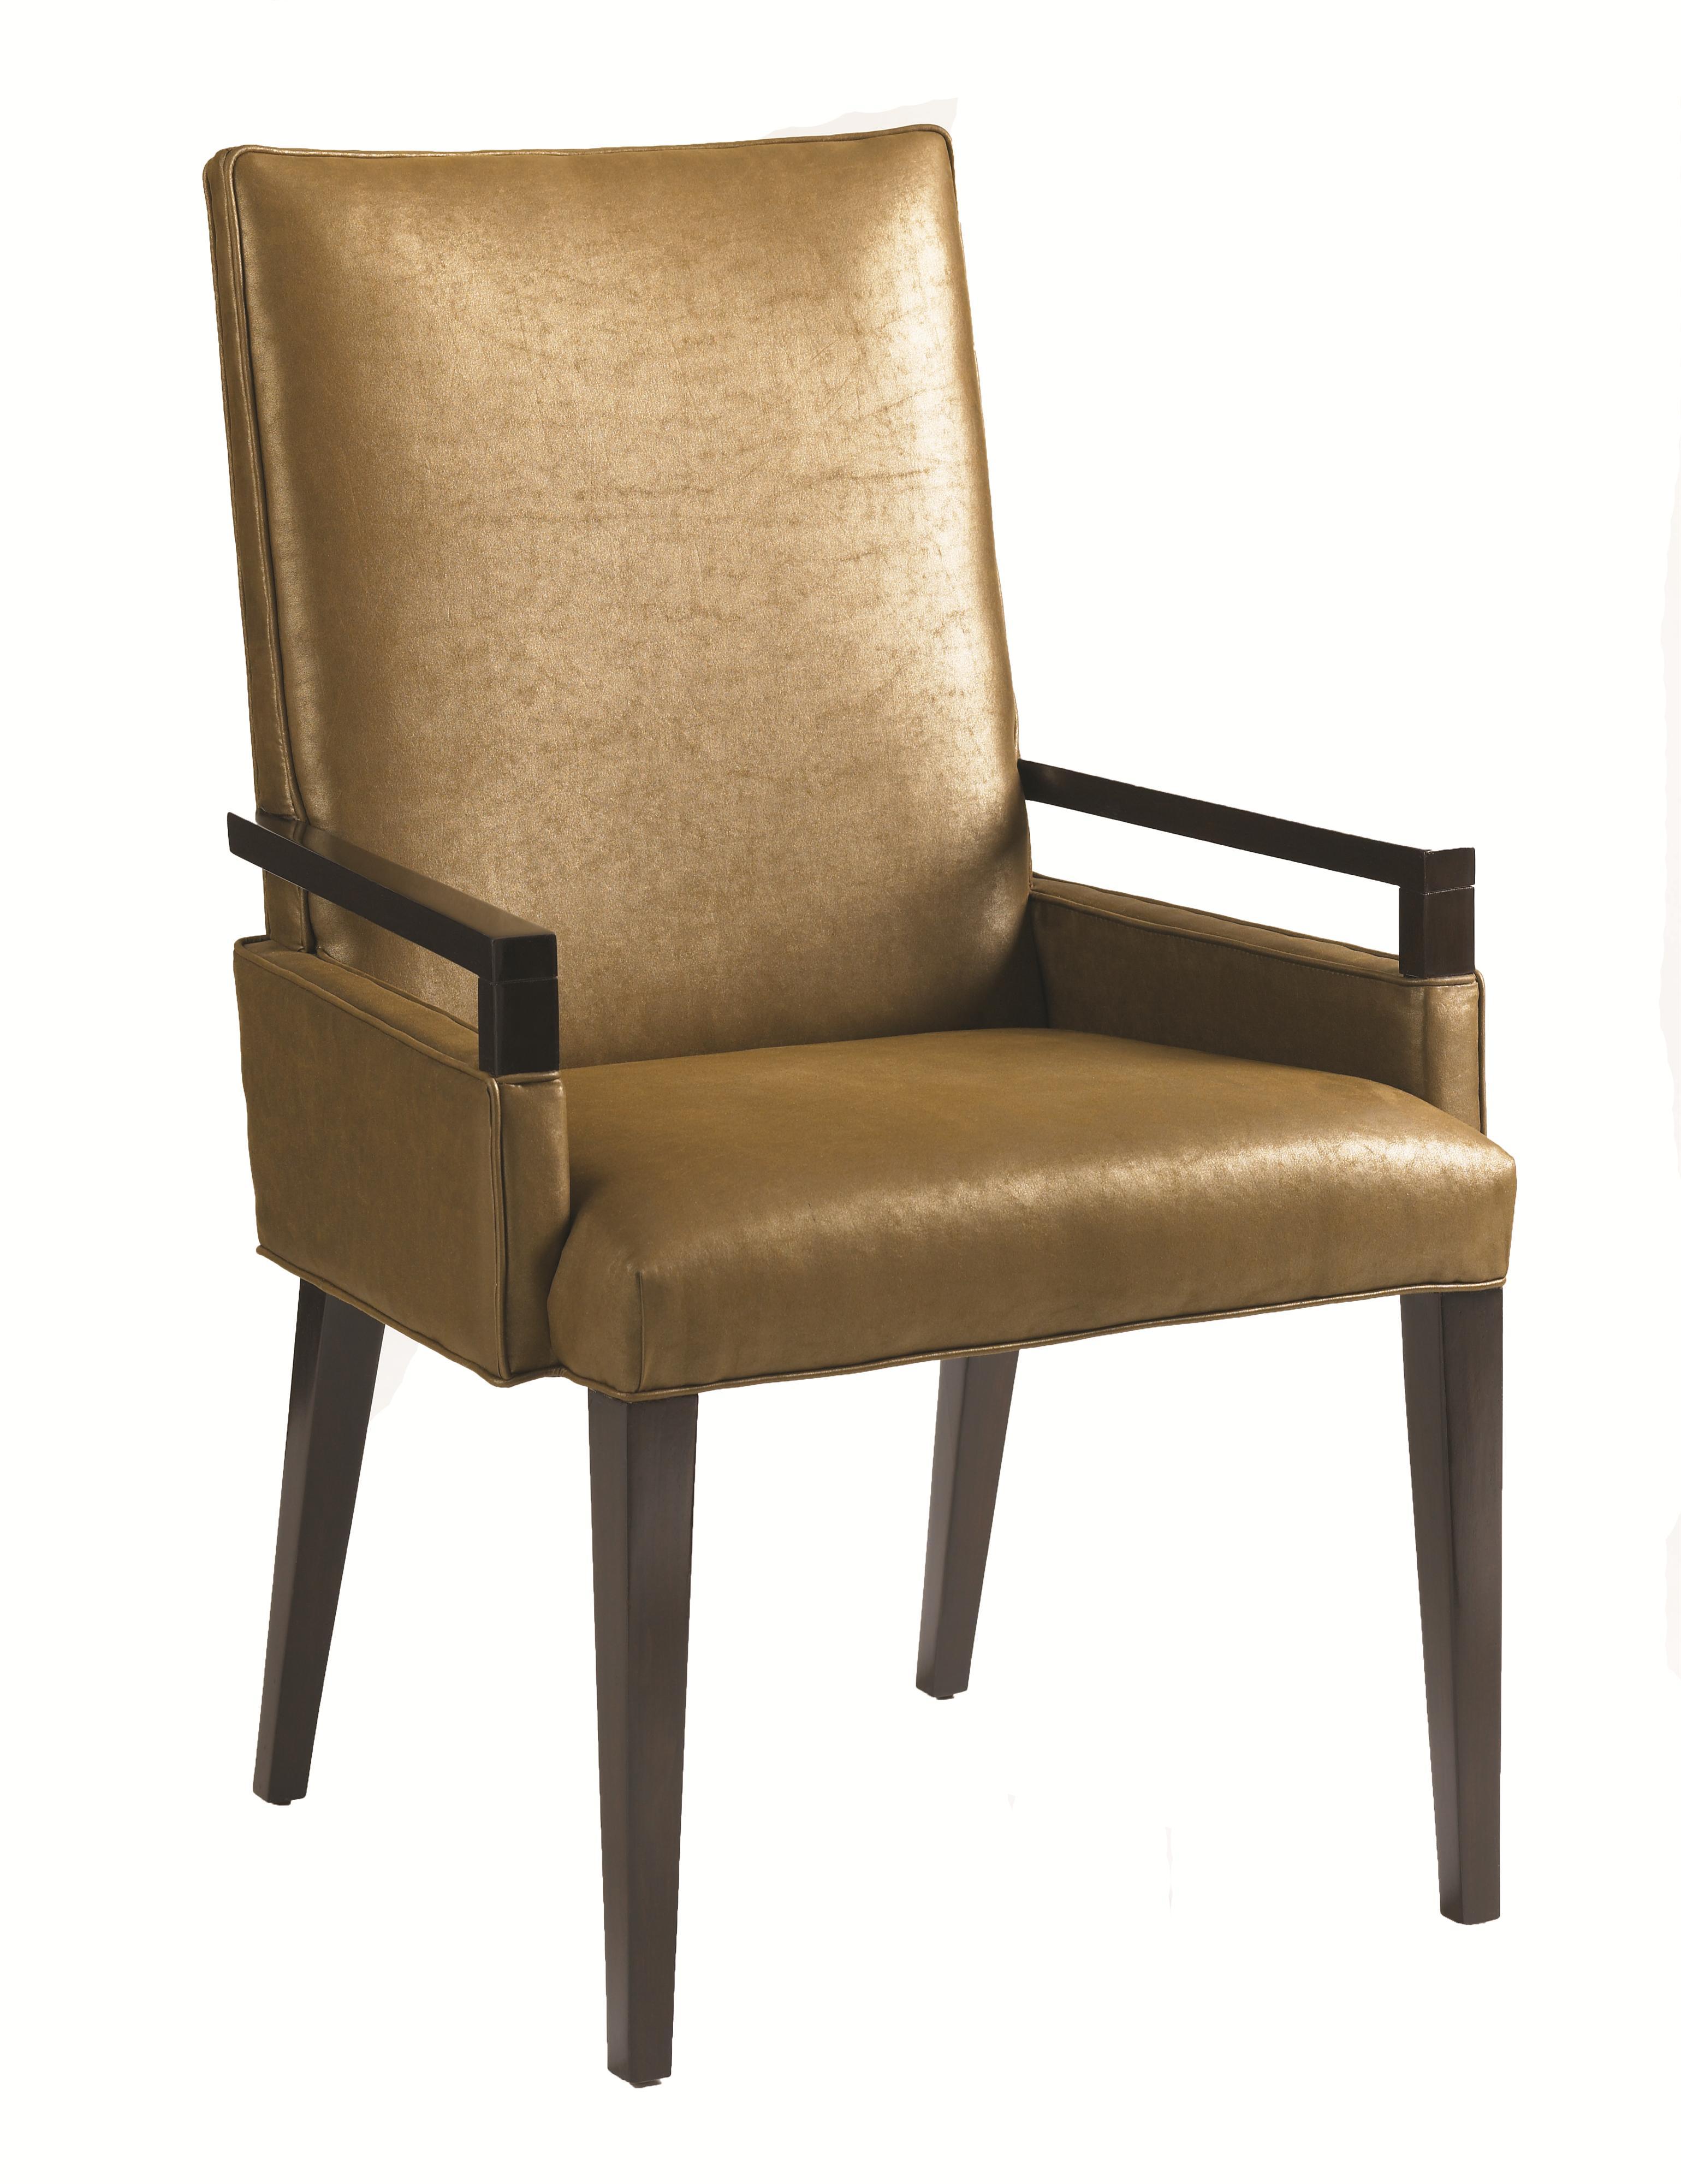 Aquarius Vision Arm Chair by Aquarius at Baer's Furniture